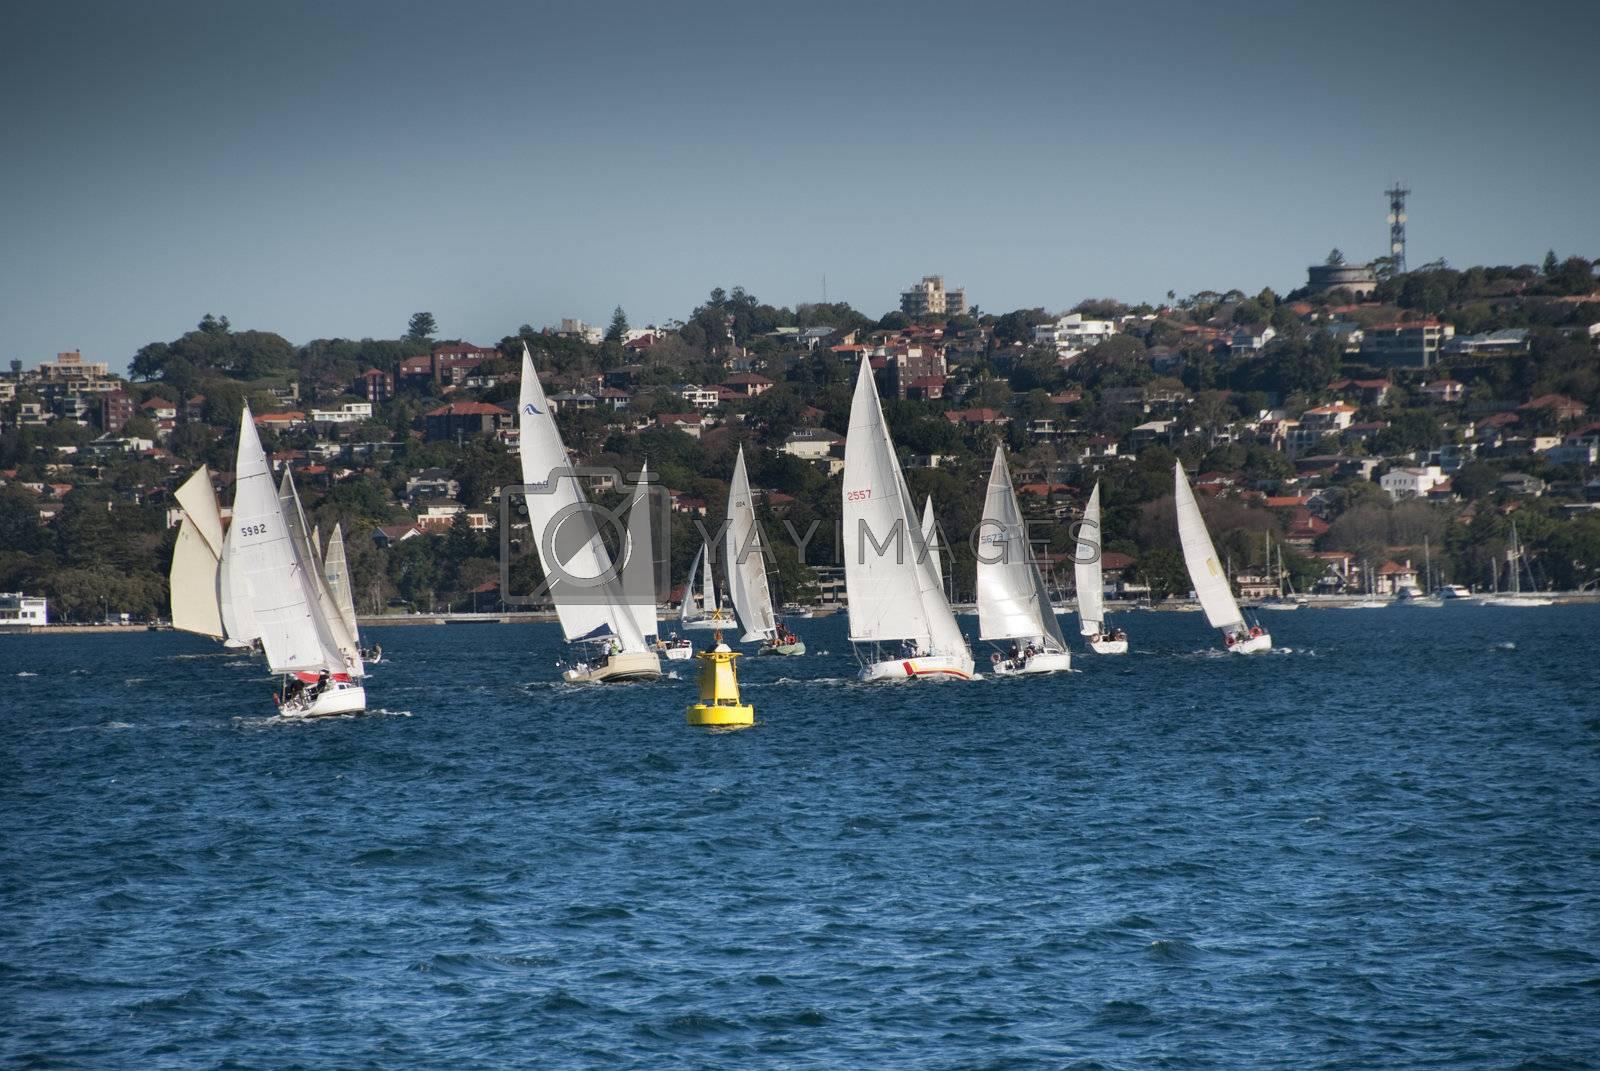 Sydney Bay, August 2009 by jovannig